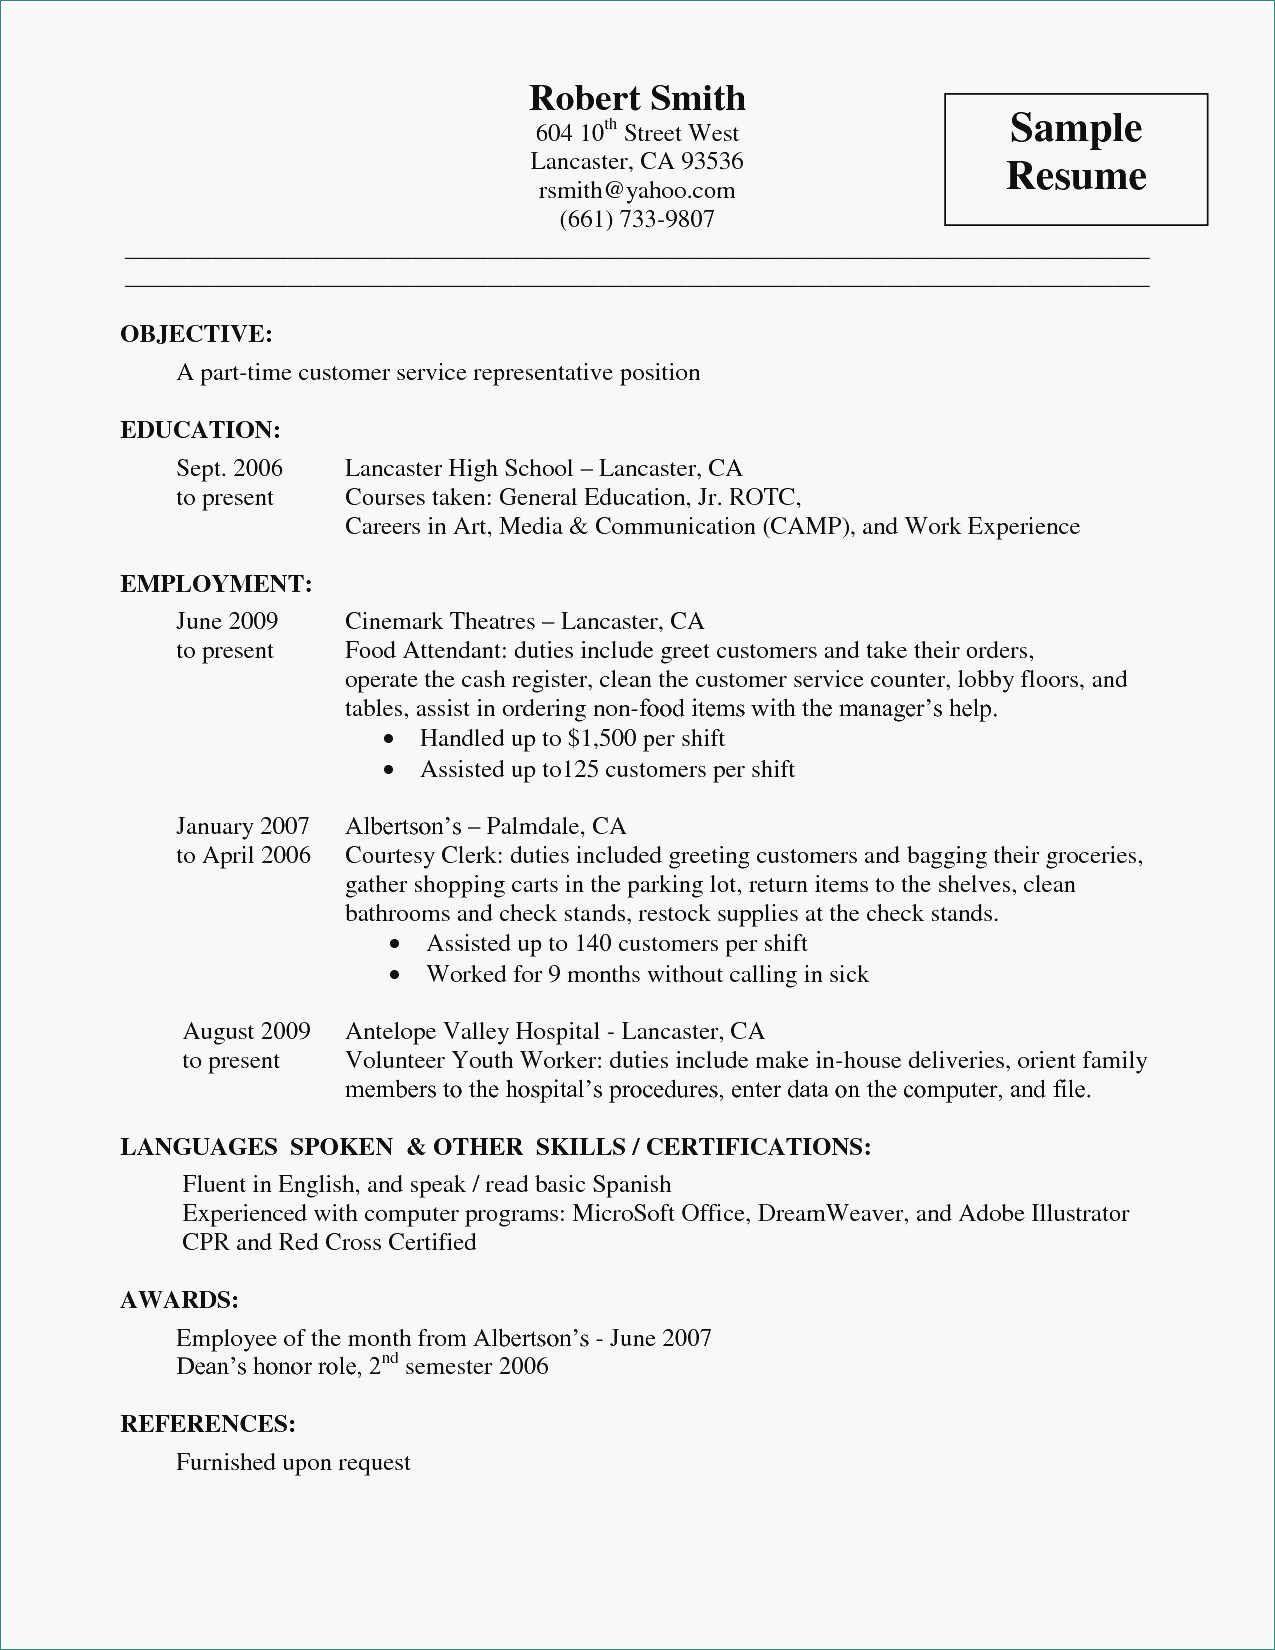 Art Deco Powerpoint Template Free Resume Resume Templates